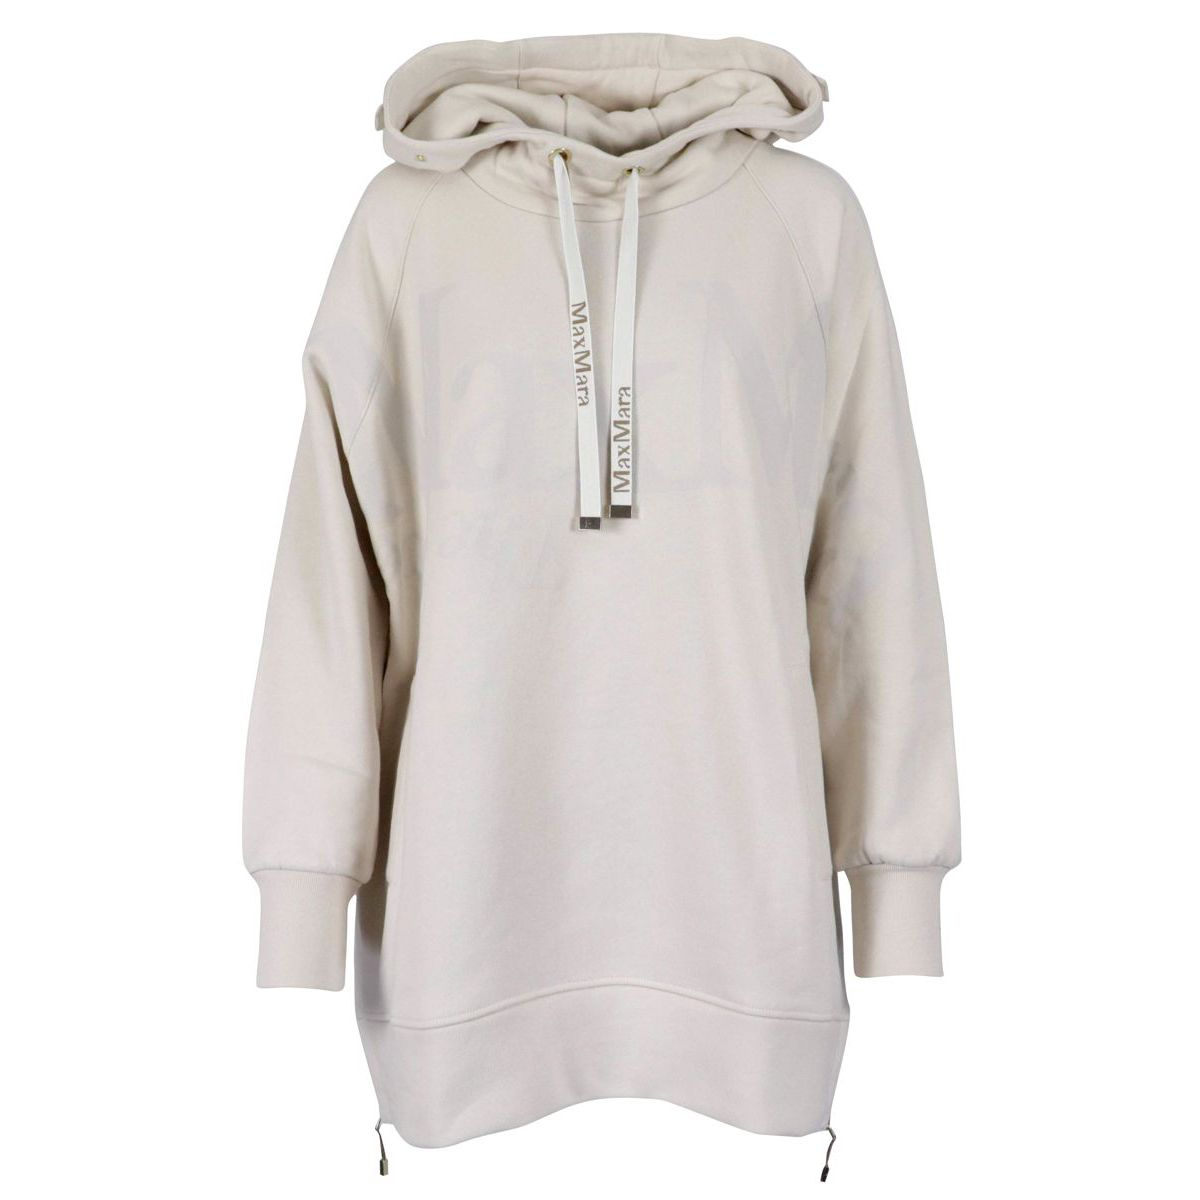 Maxi sweatshirt in Nupar cotton with side zips Putty S MAX MARA